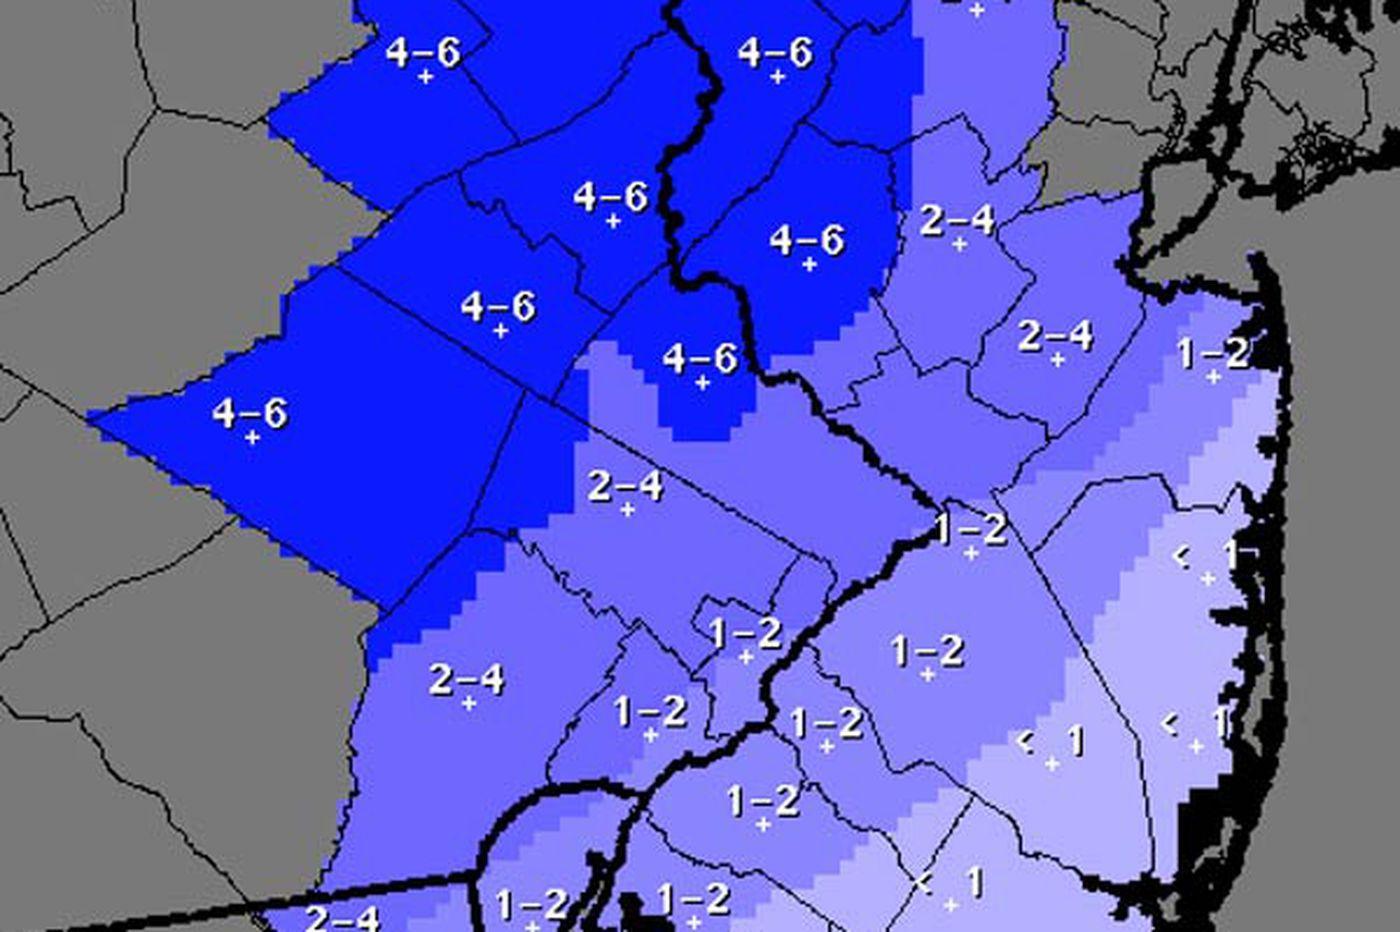 National Weather Service: Snow, rain headed to region Saturday